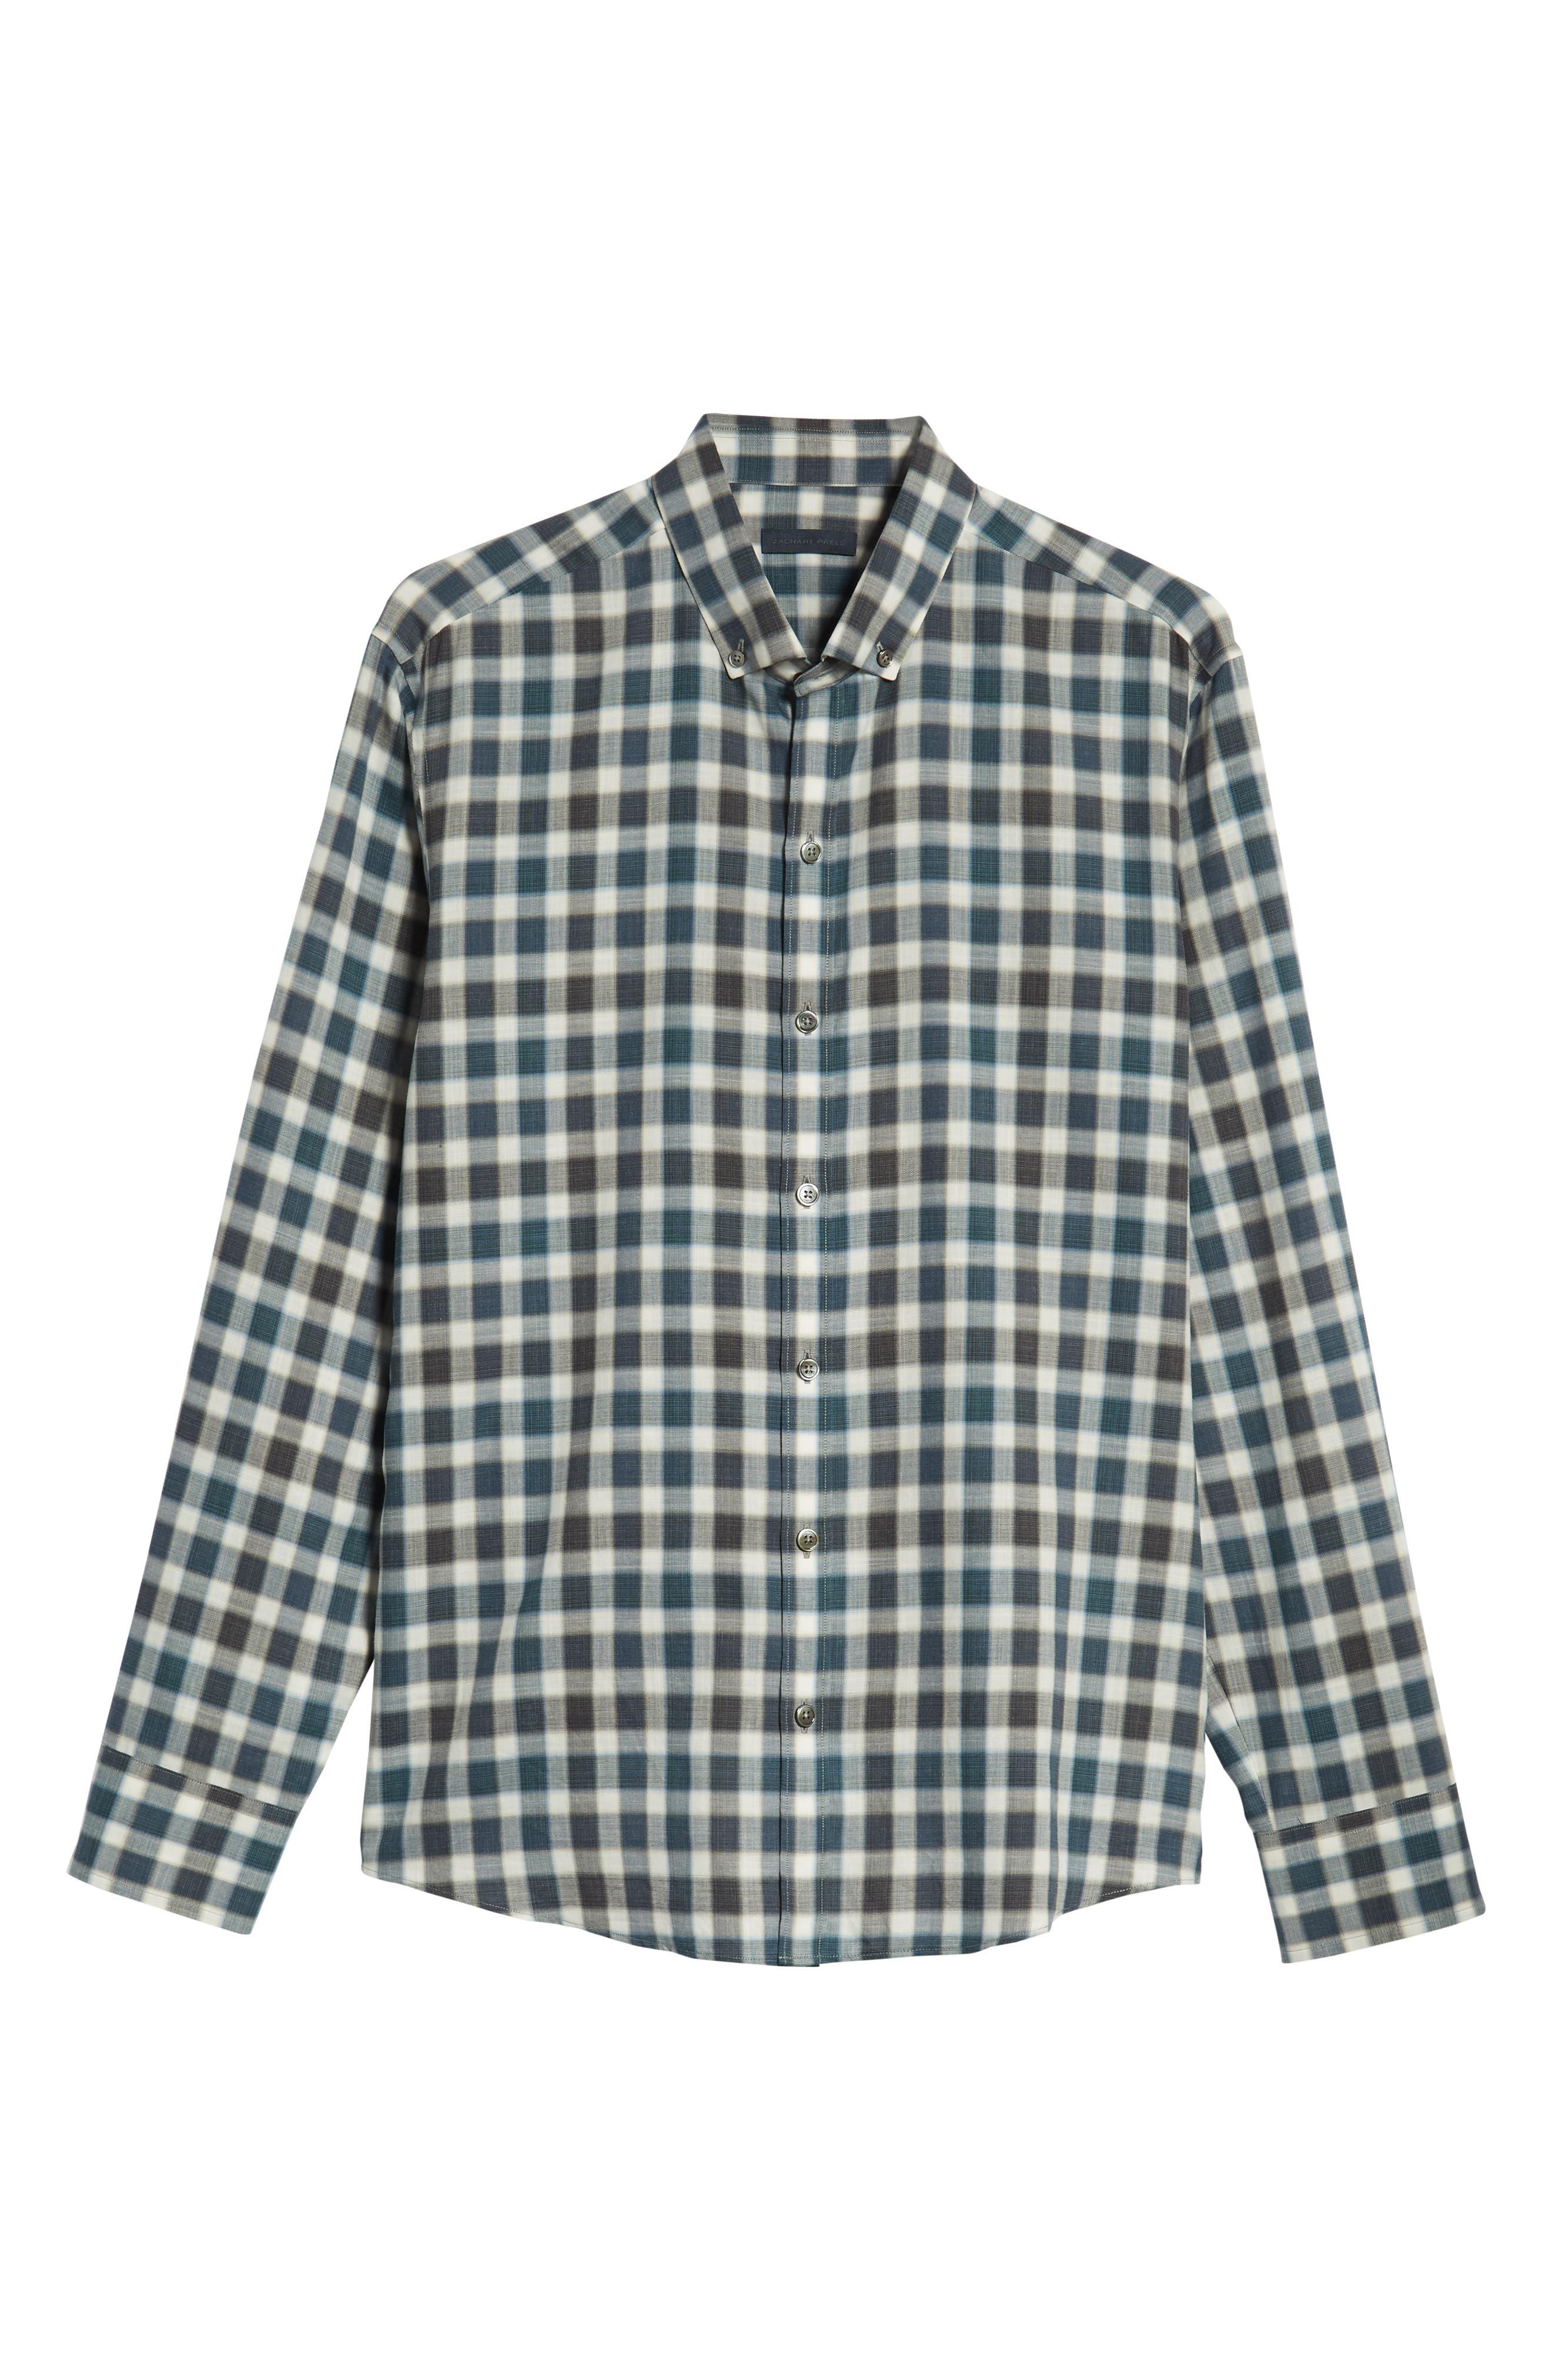 ZACHARY PRELL, Buffa Regular Fit Plaid Flannel Sport Shirt, Alternate thumbnail 5, color, DARK TEAL